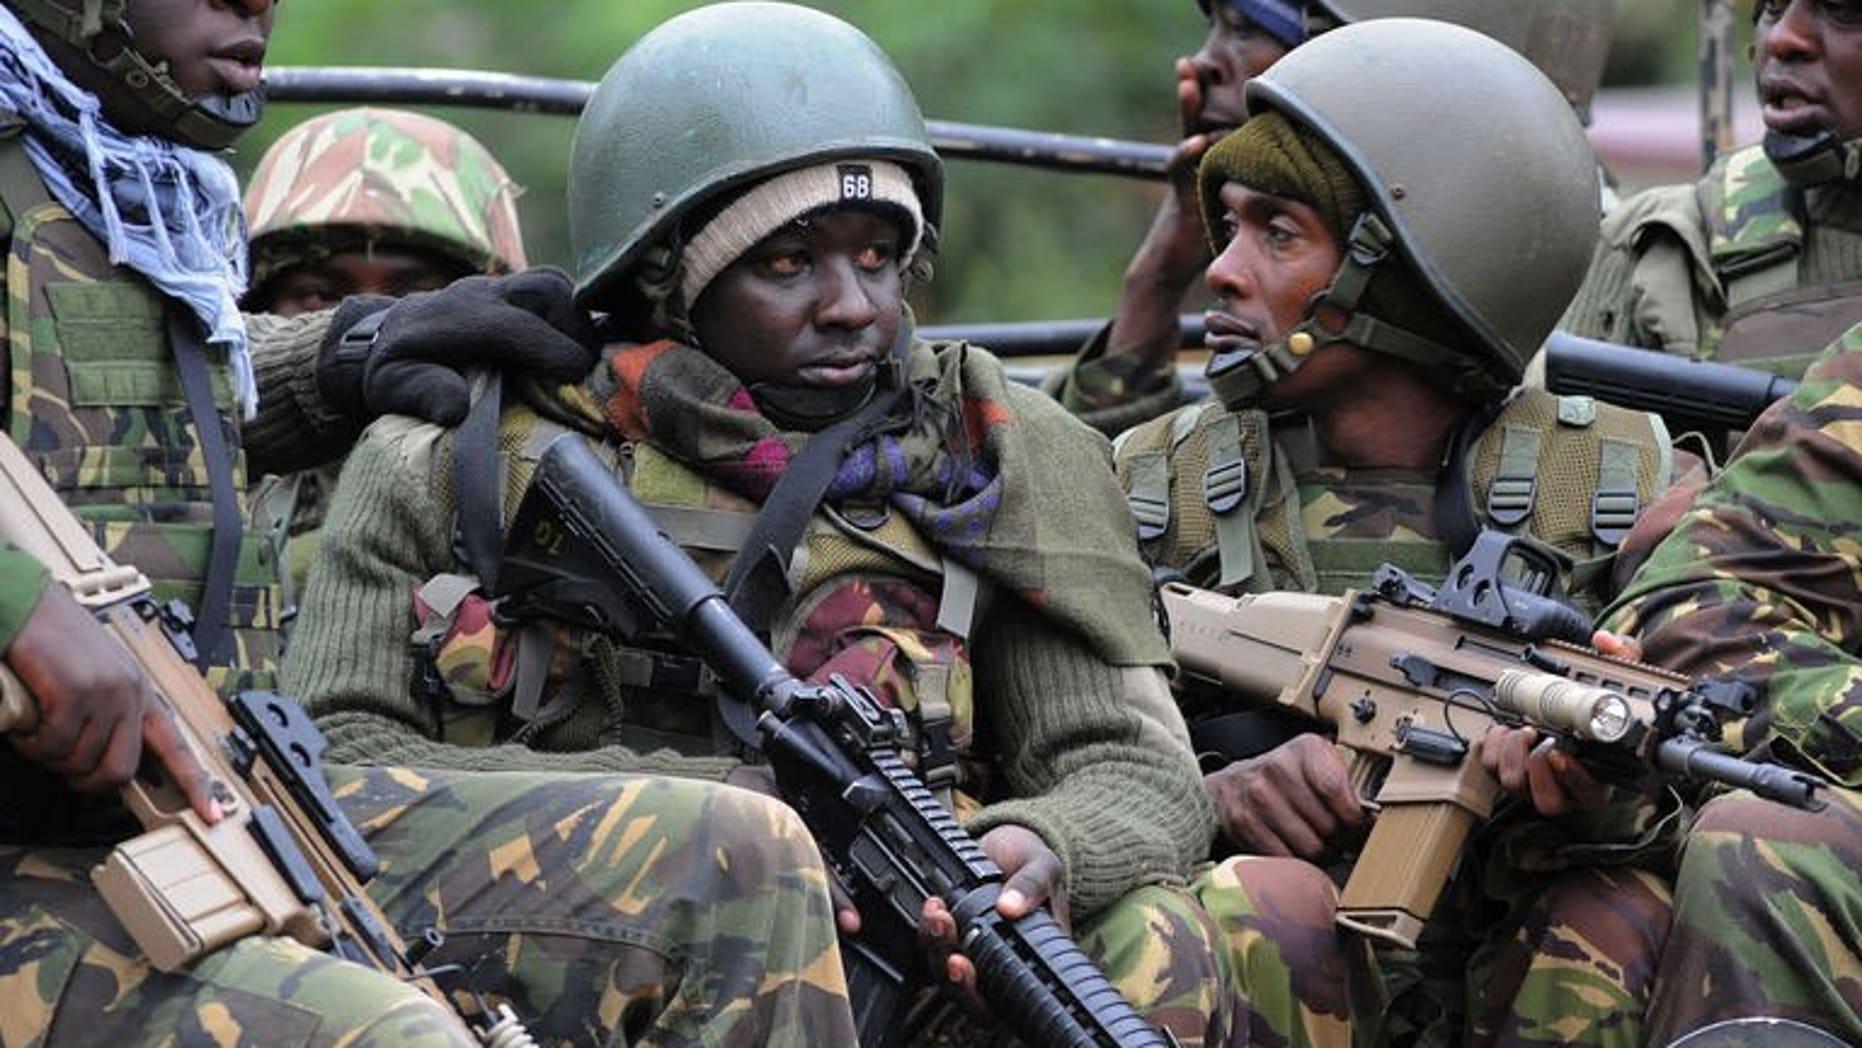 Kenya Defense Forces (KDF) arrive on September 22, 2013 at the Westgate mall in Nairobi.